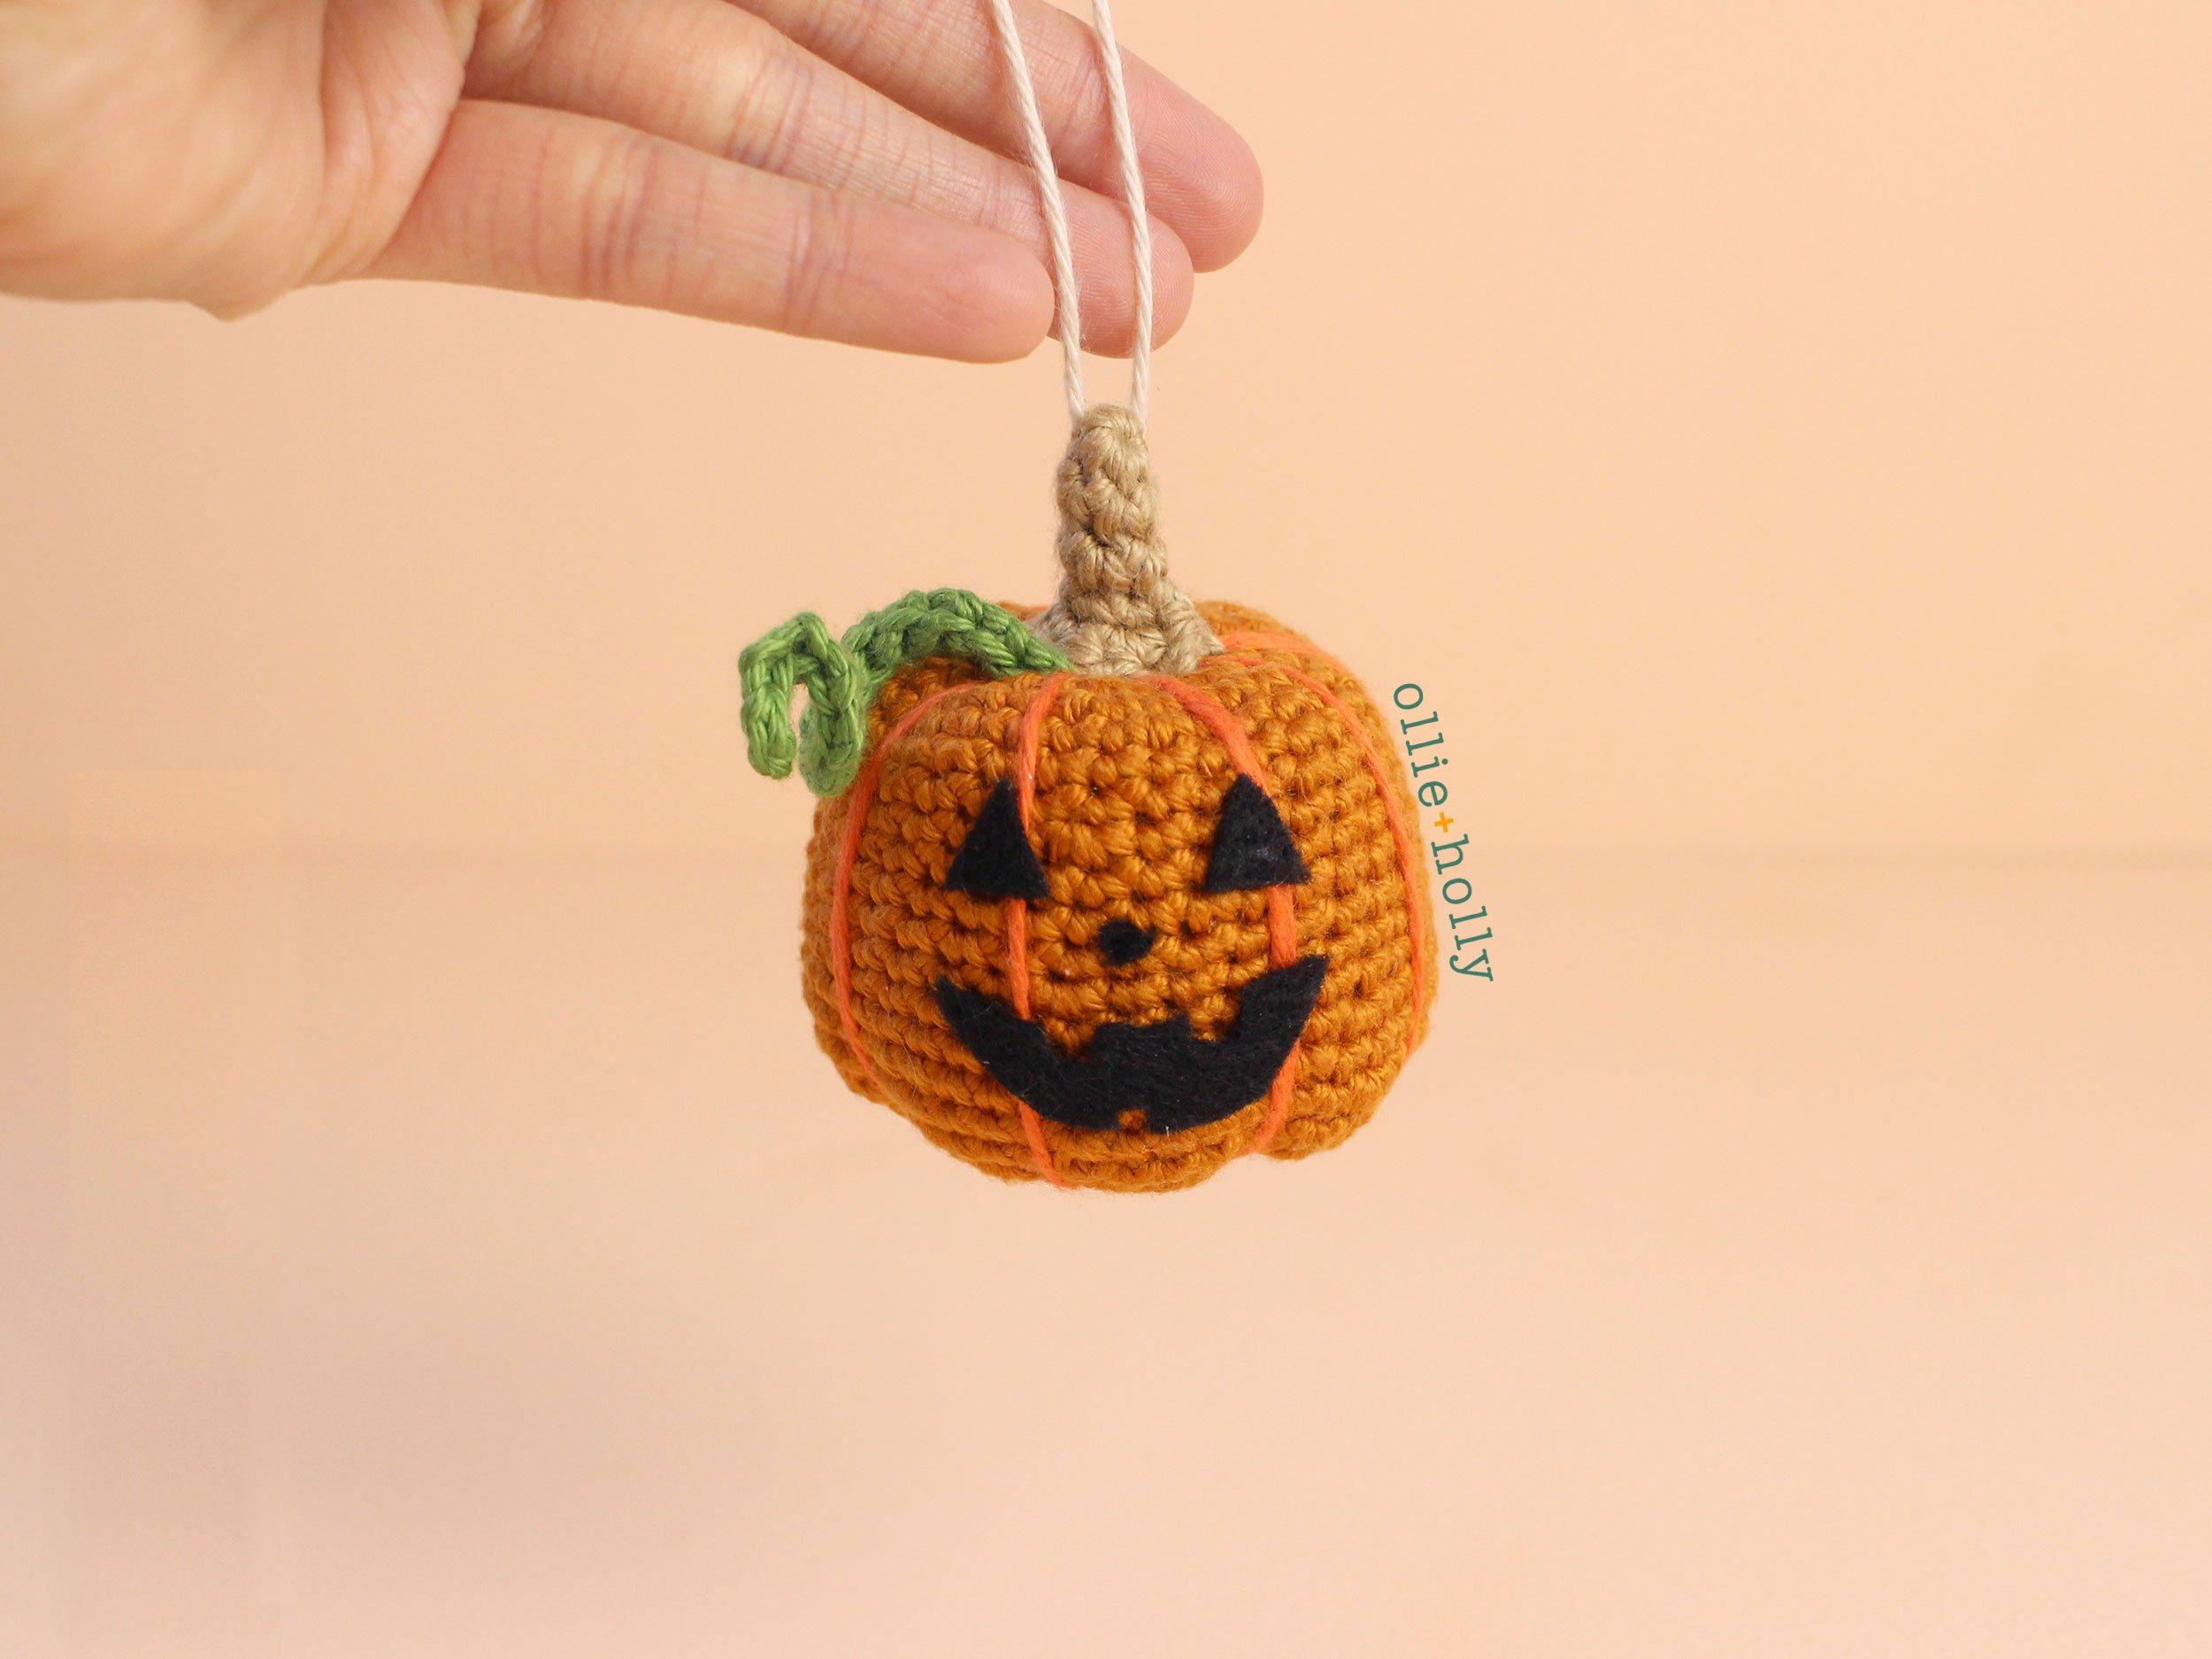 Medium Crochet Pumpkin Pattern - Crochet 365 Knit Too | 1875x2500